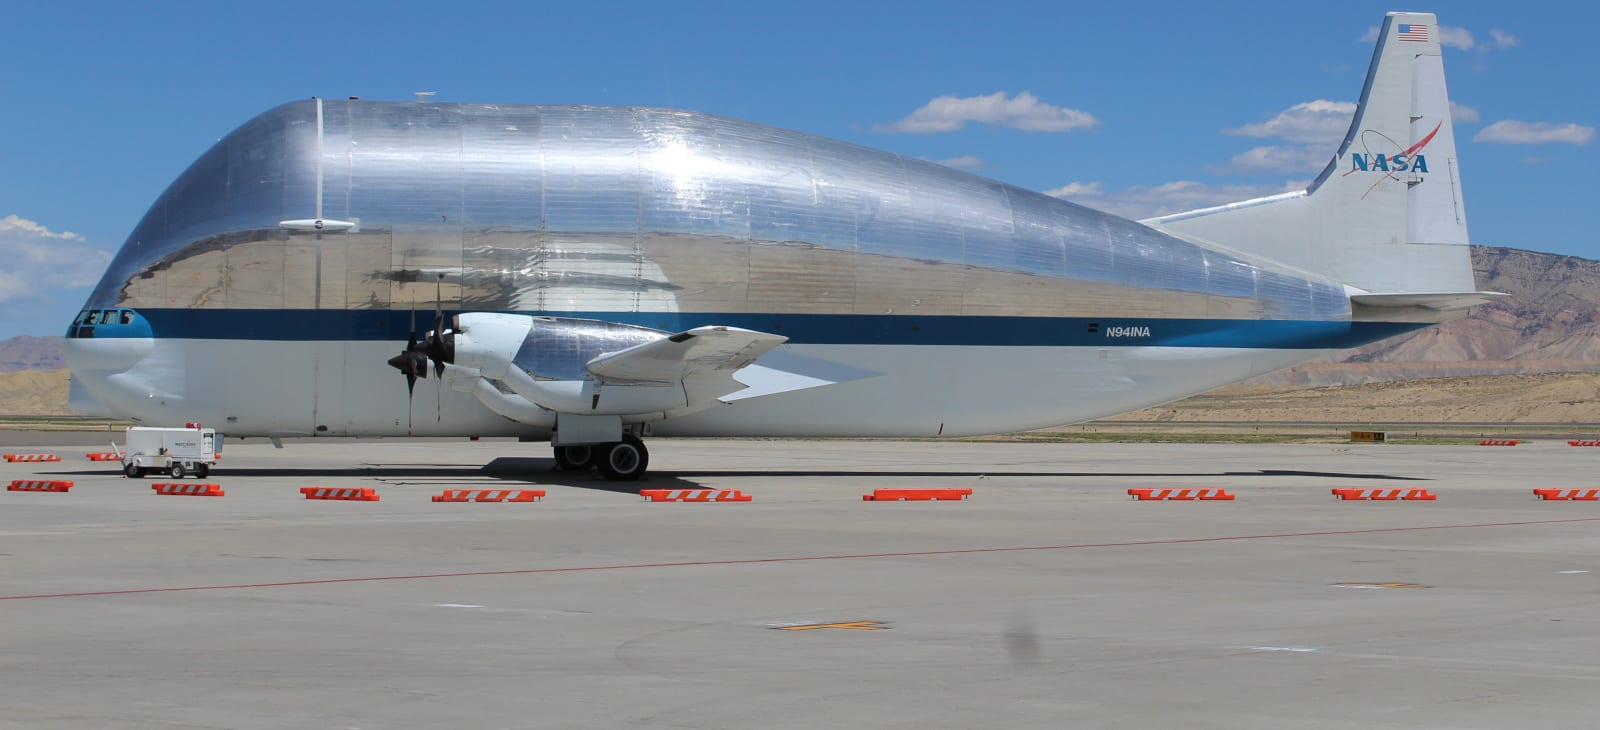 Grand Junction Regional Airport Nasa Plane Super Guppy Mission